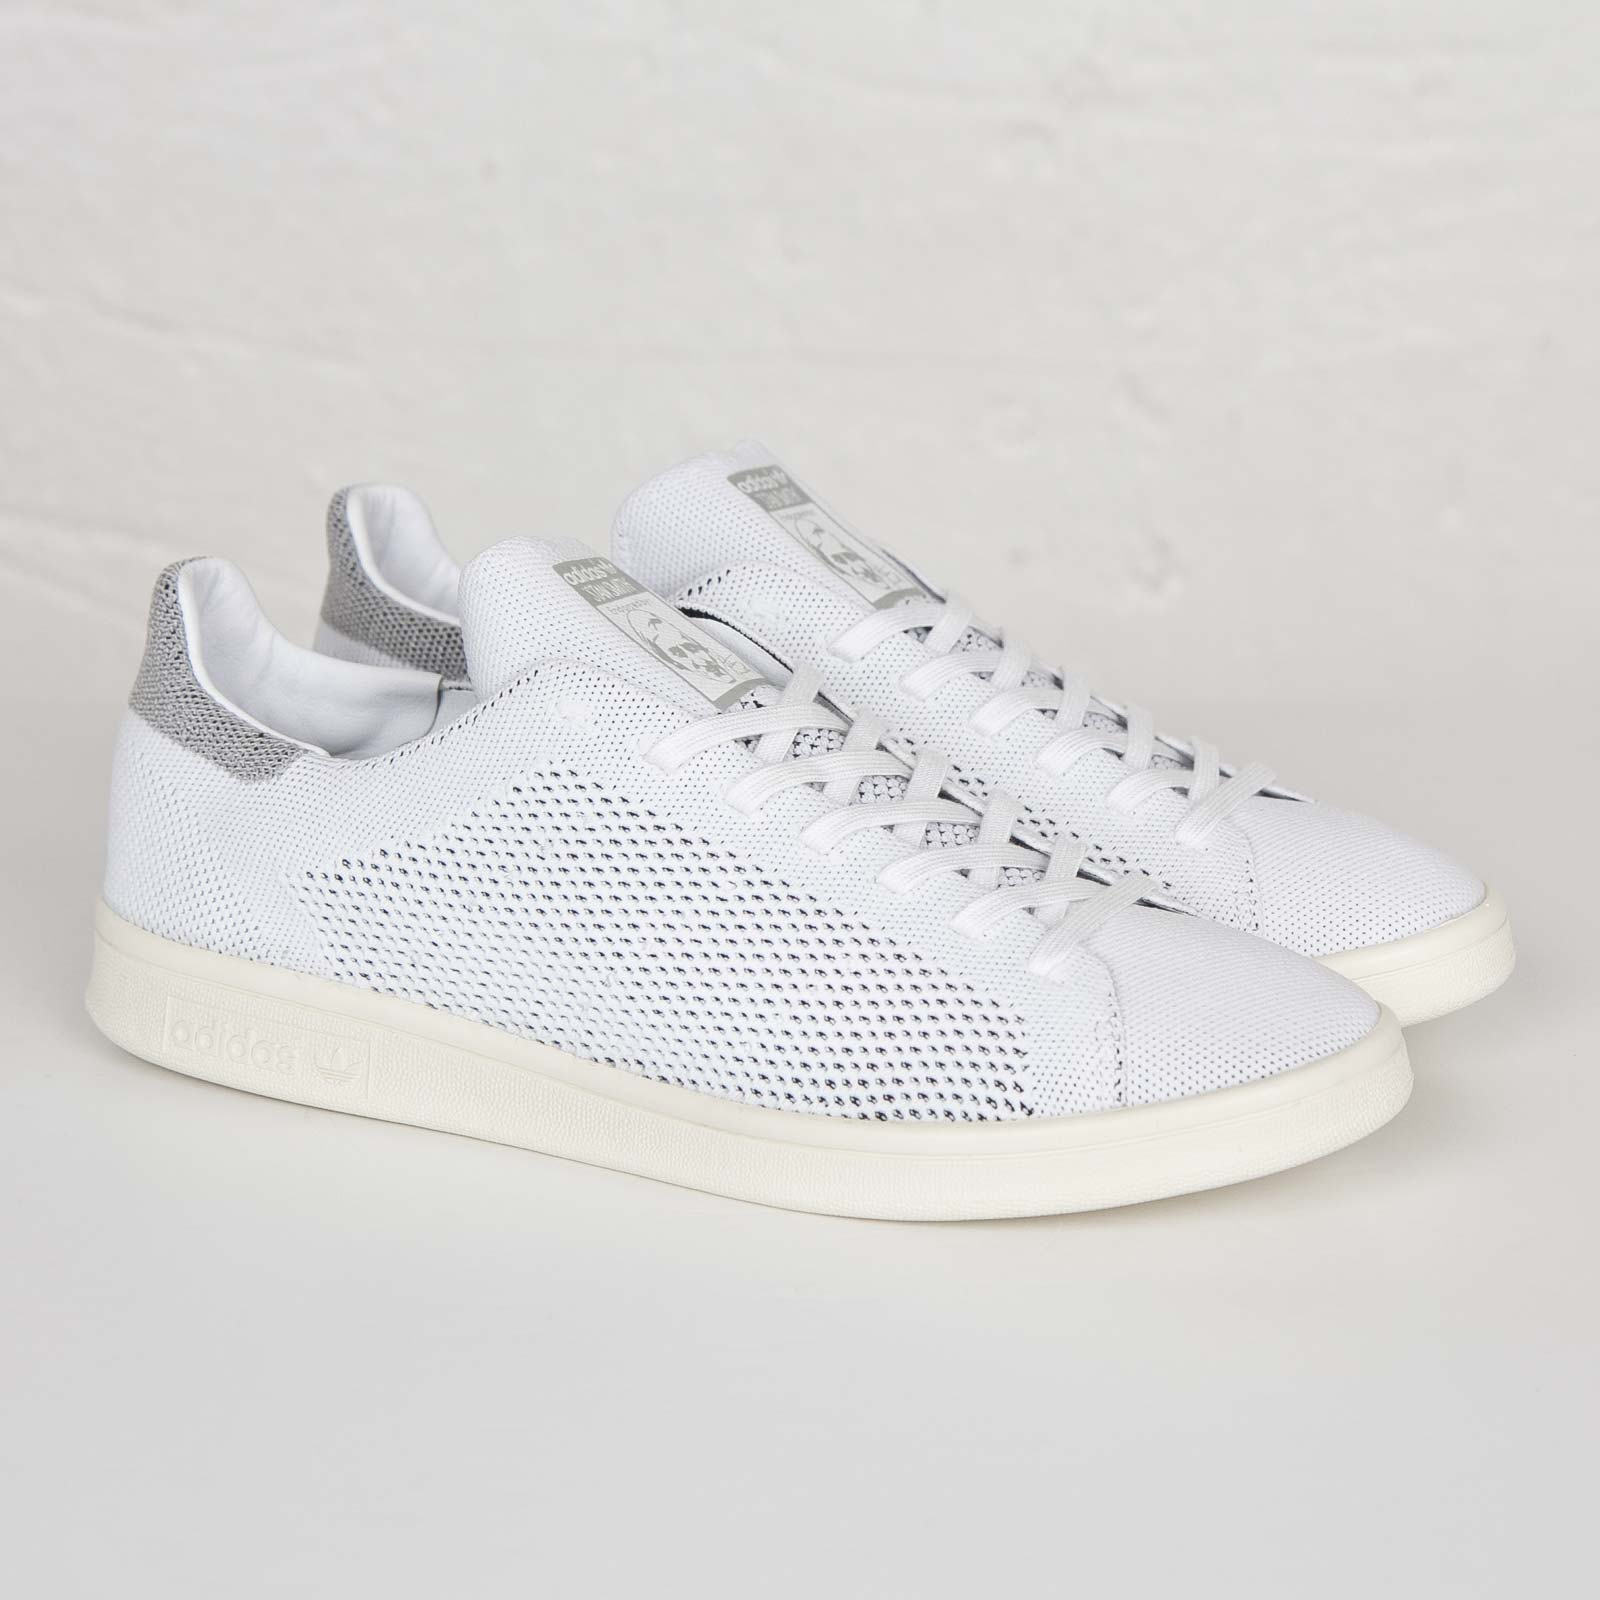 adidas Stan Smith Primeknit Herren Sneaker Blau: